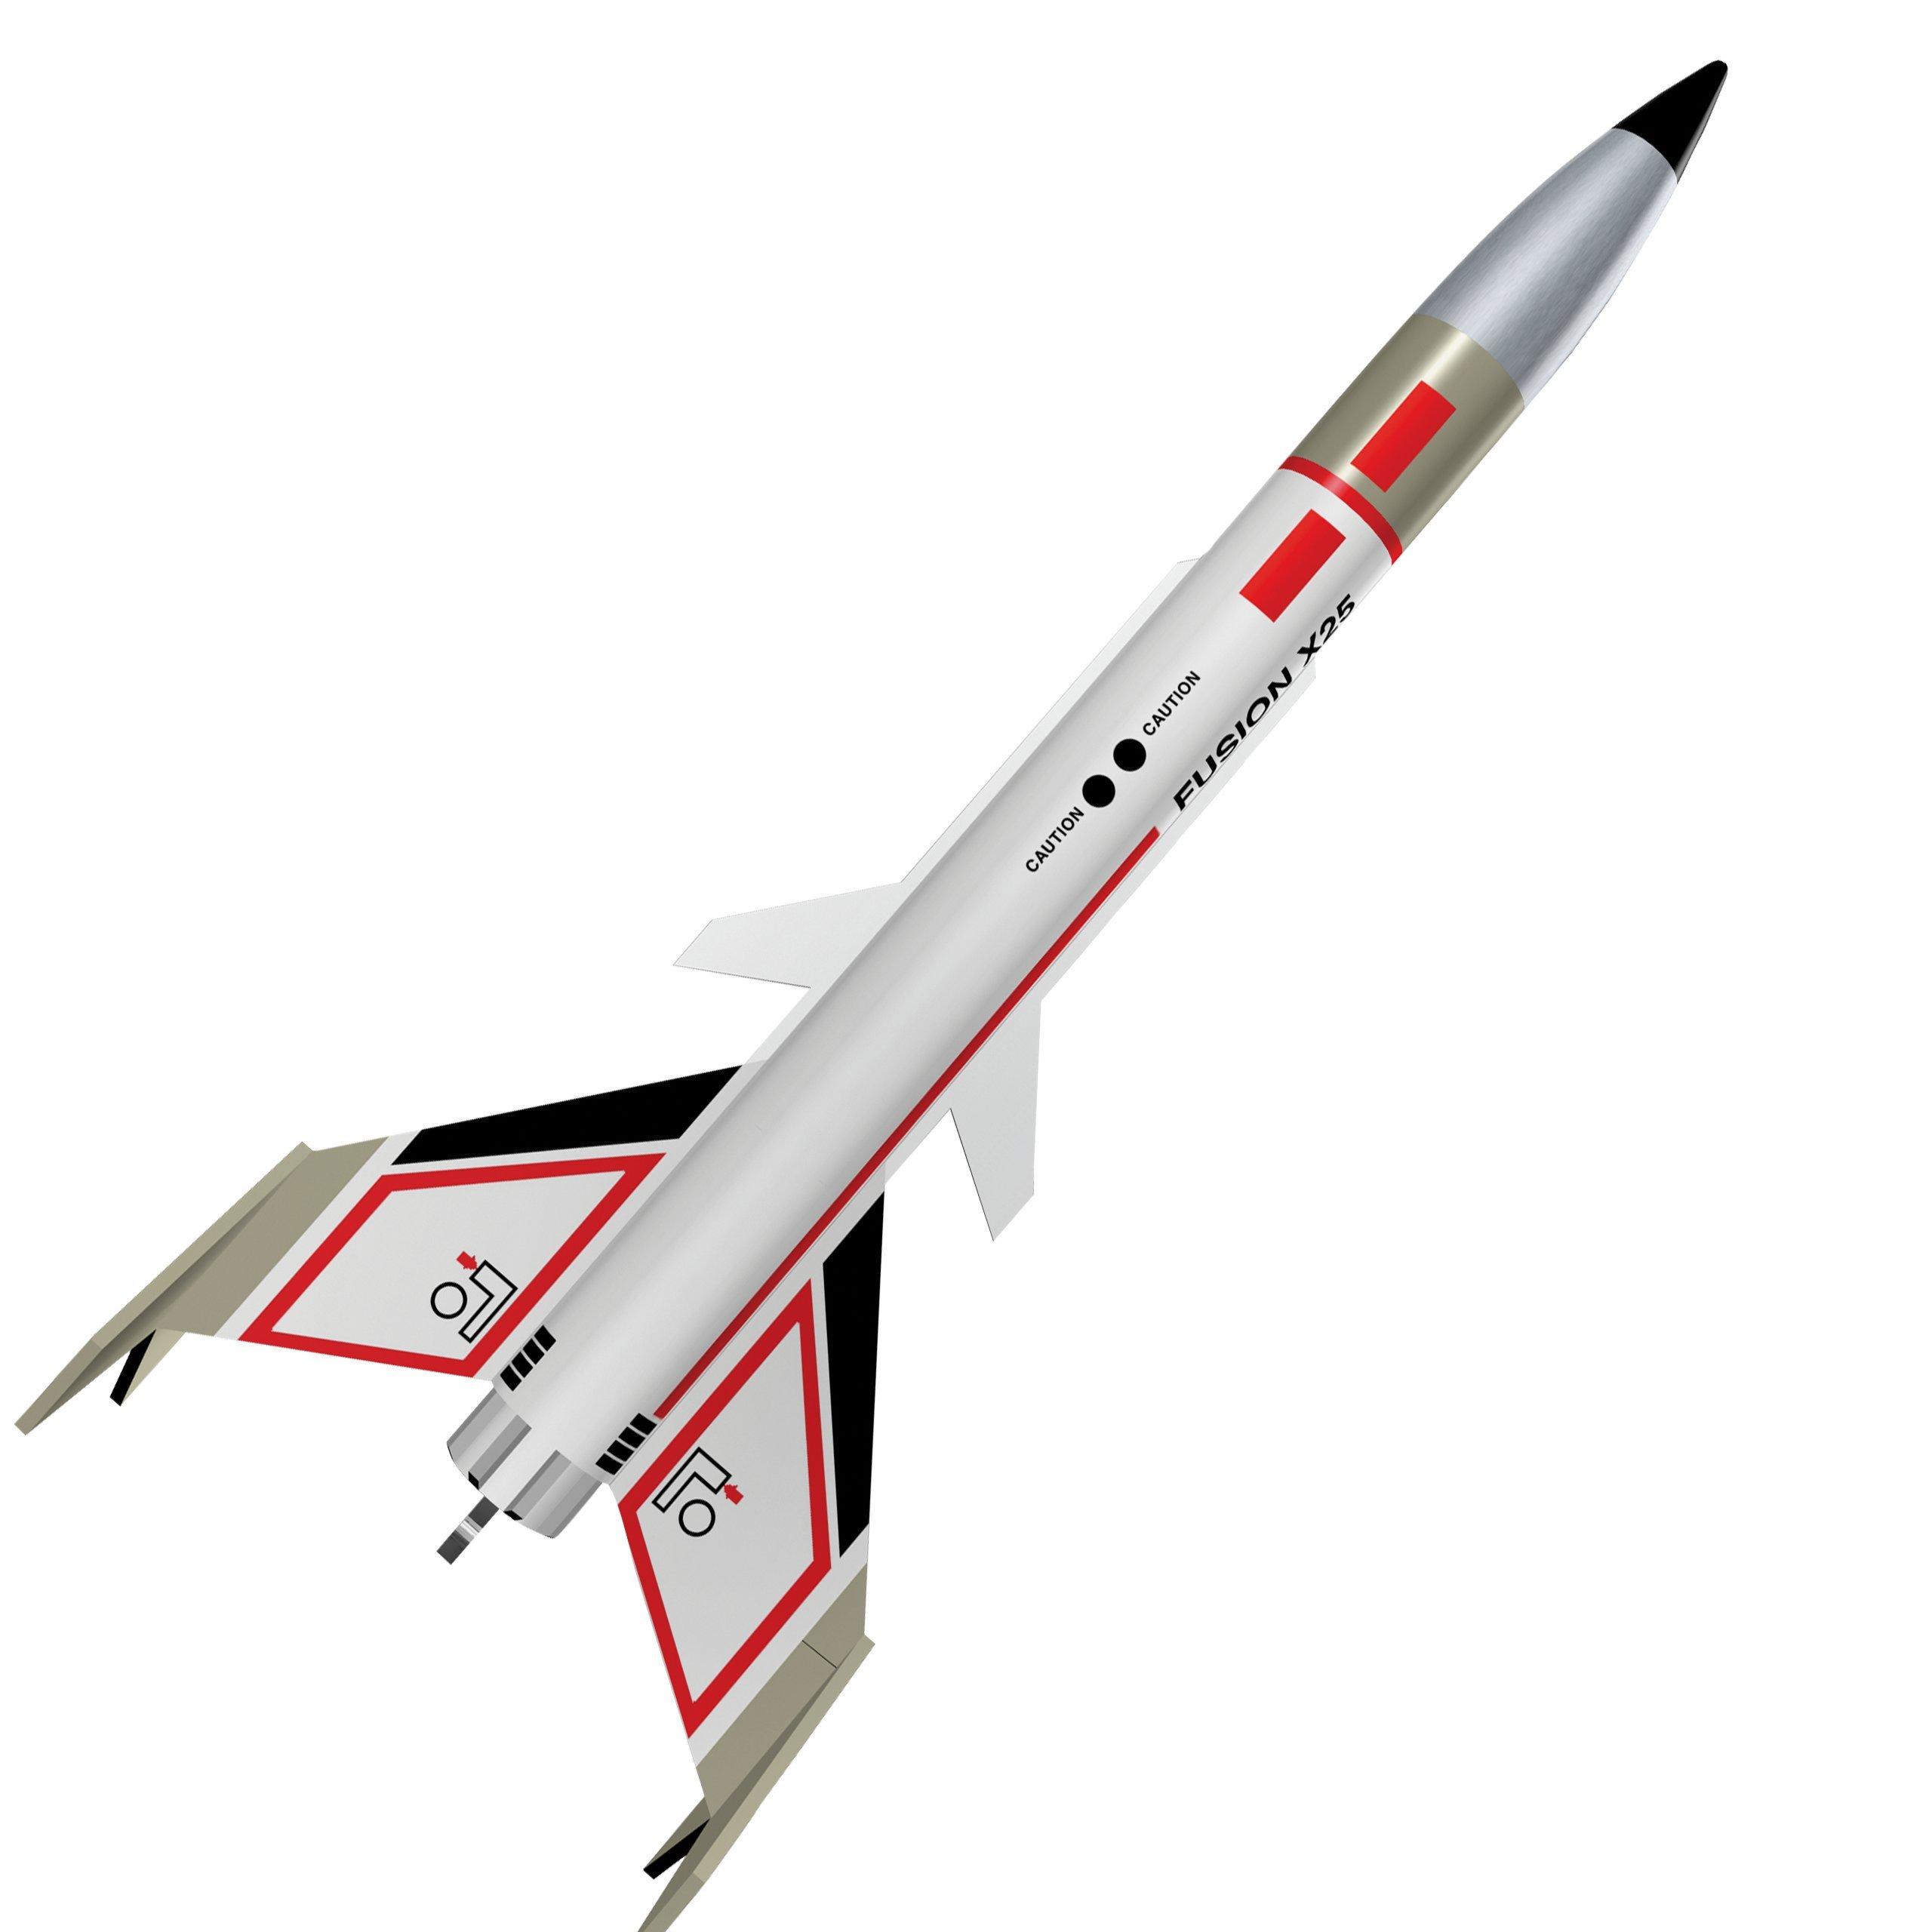 Estes Fusion X25 Model Rocket Kit